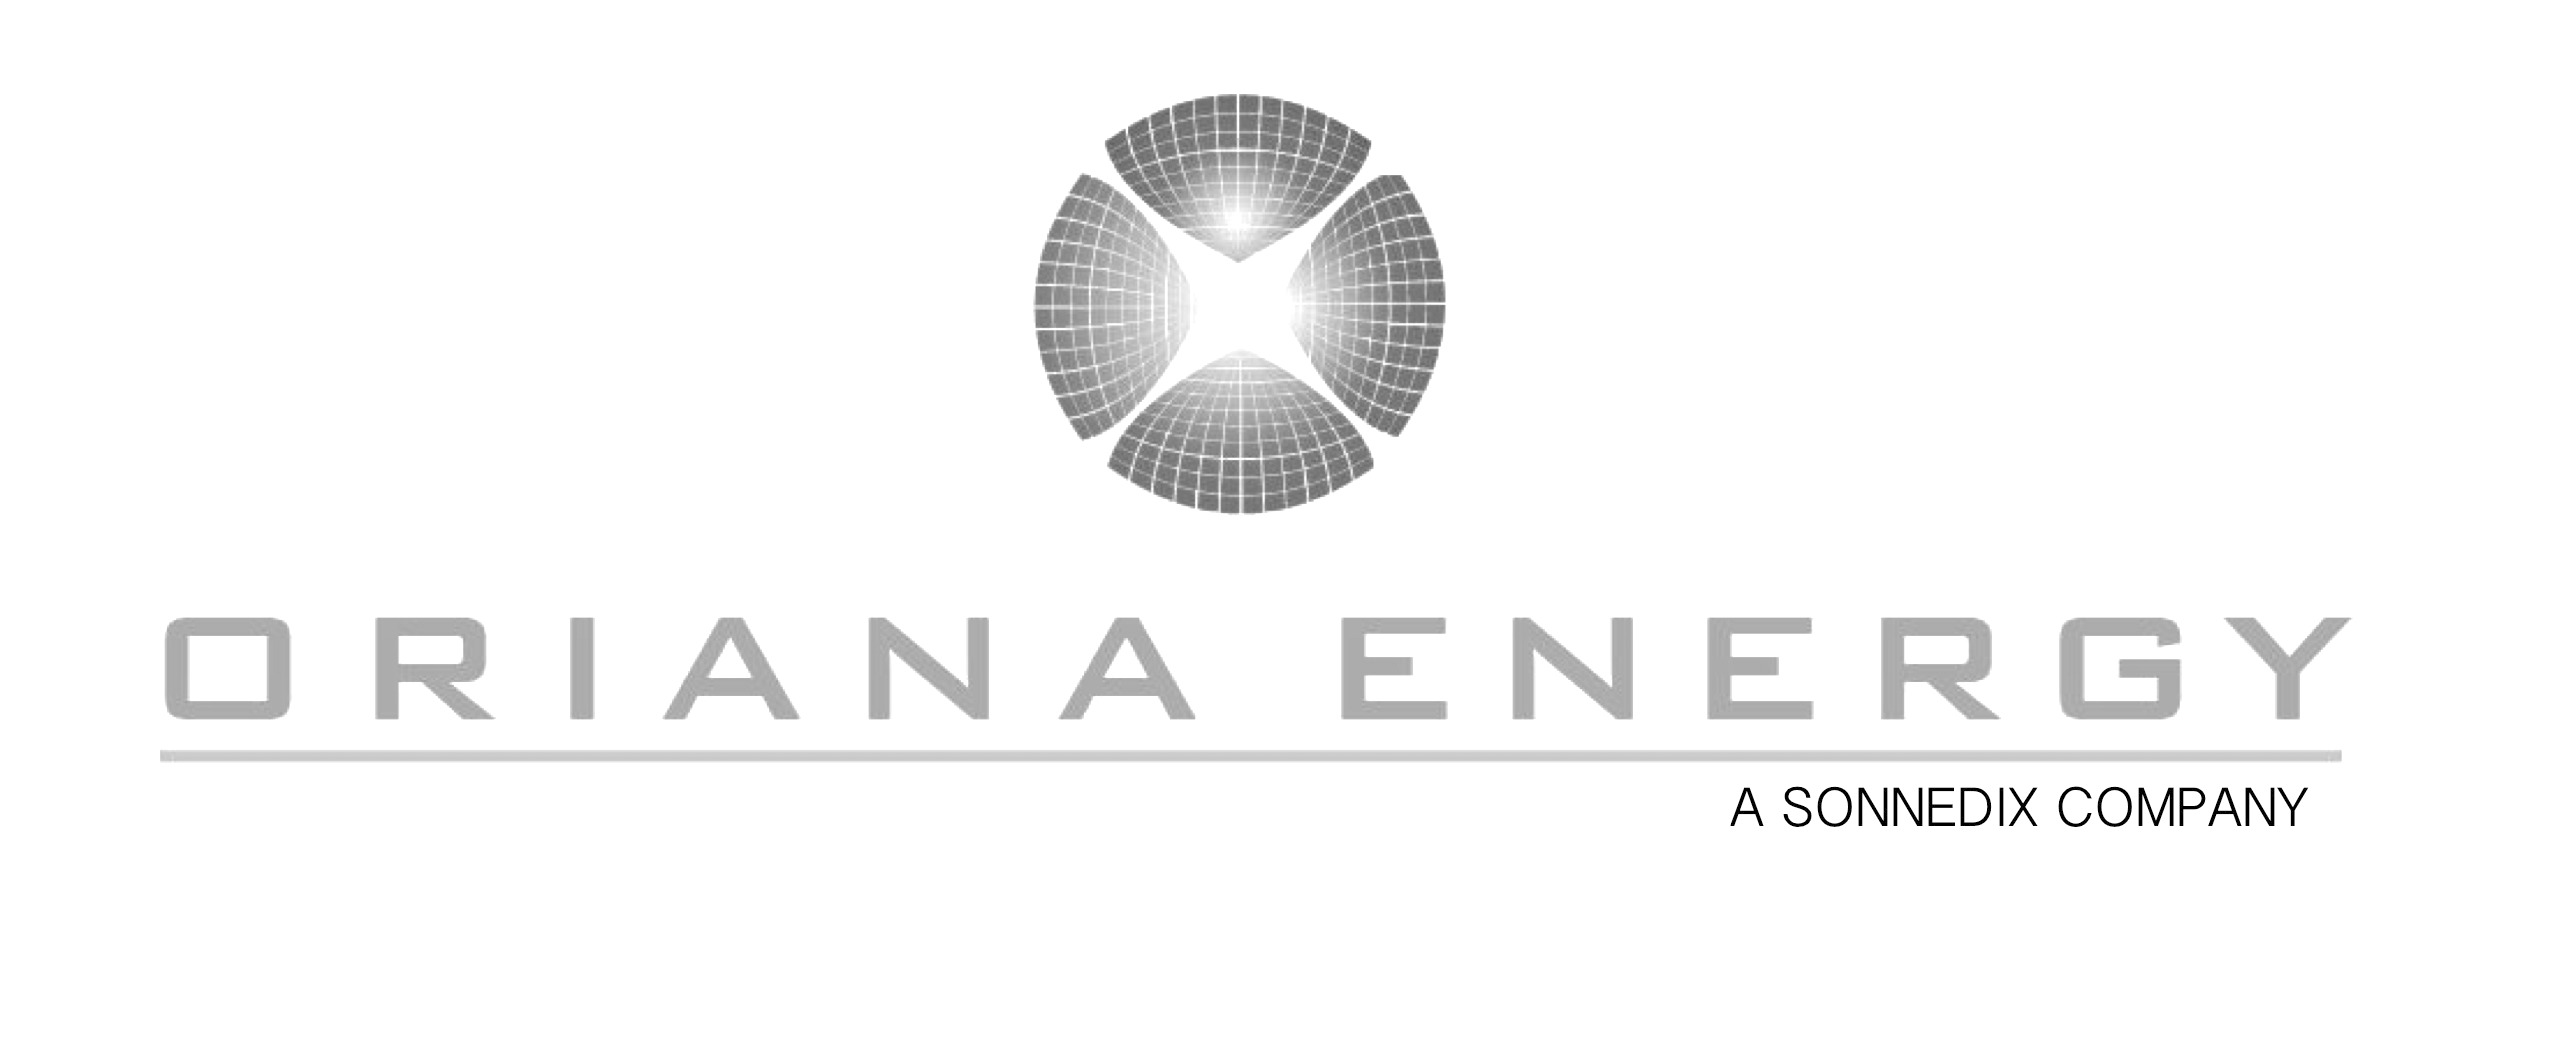 Oriana-logo_edited